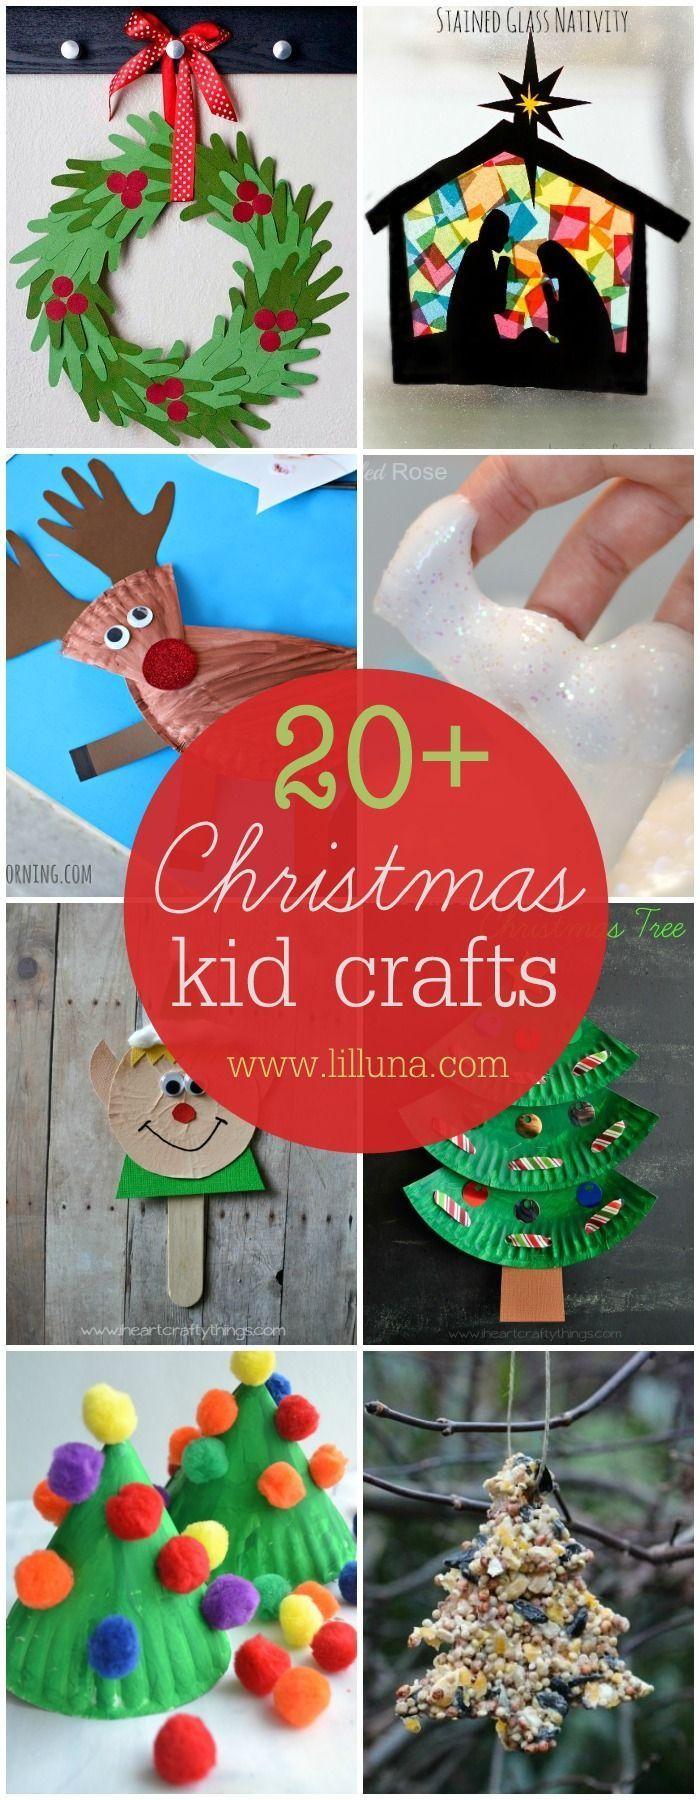 Best 25+ Christmas crafts pinterest ideas on Pinterest ...